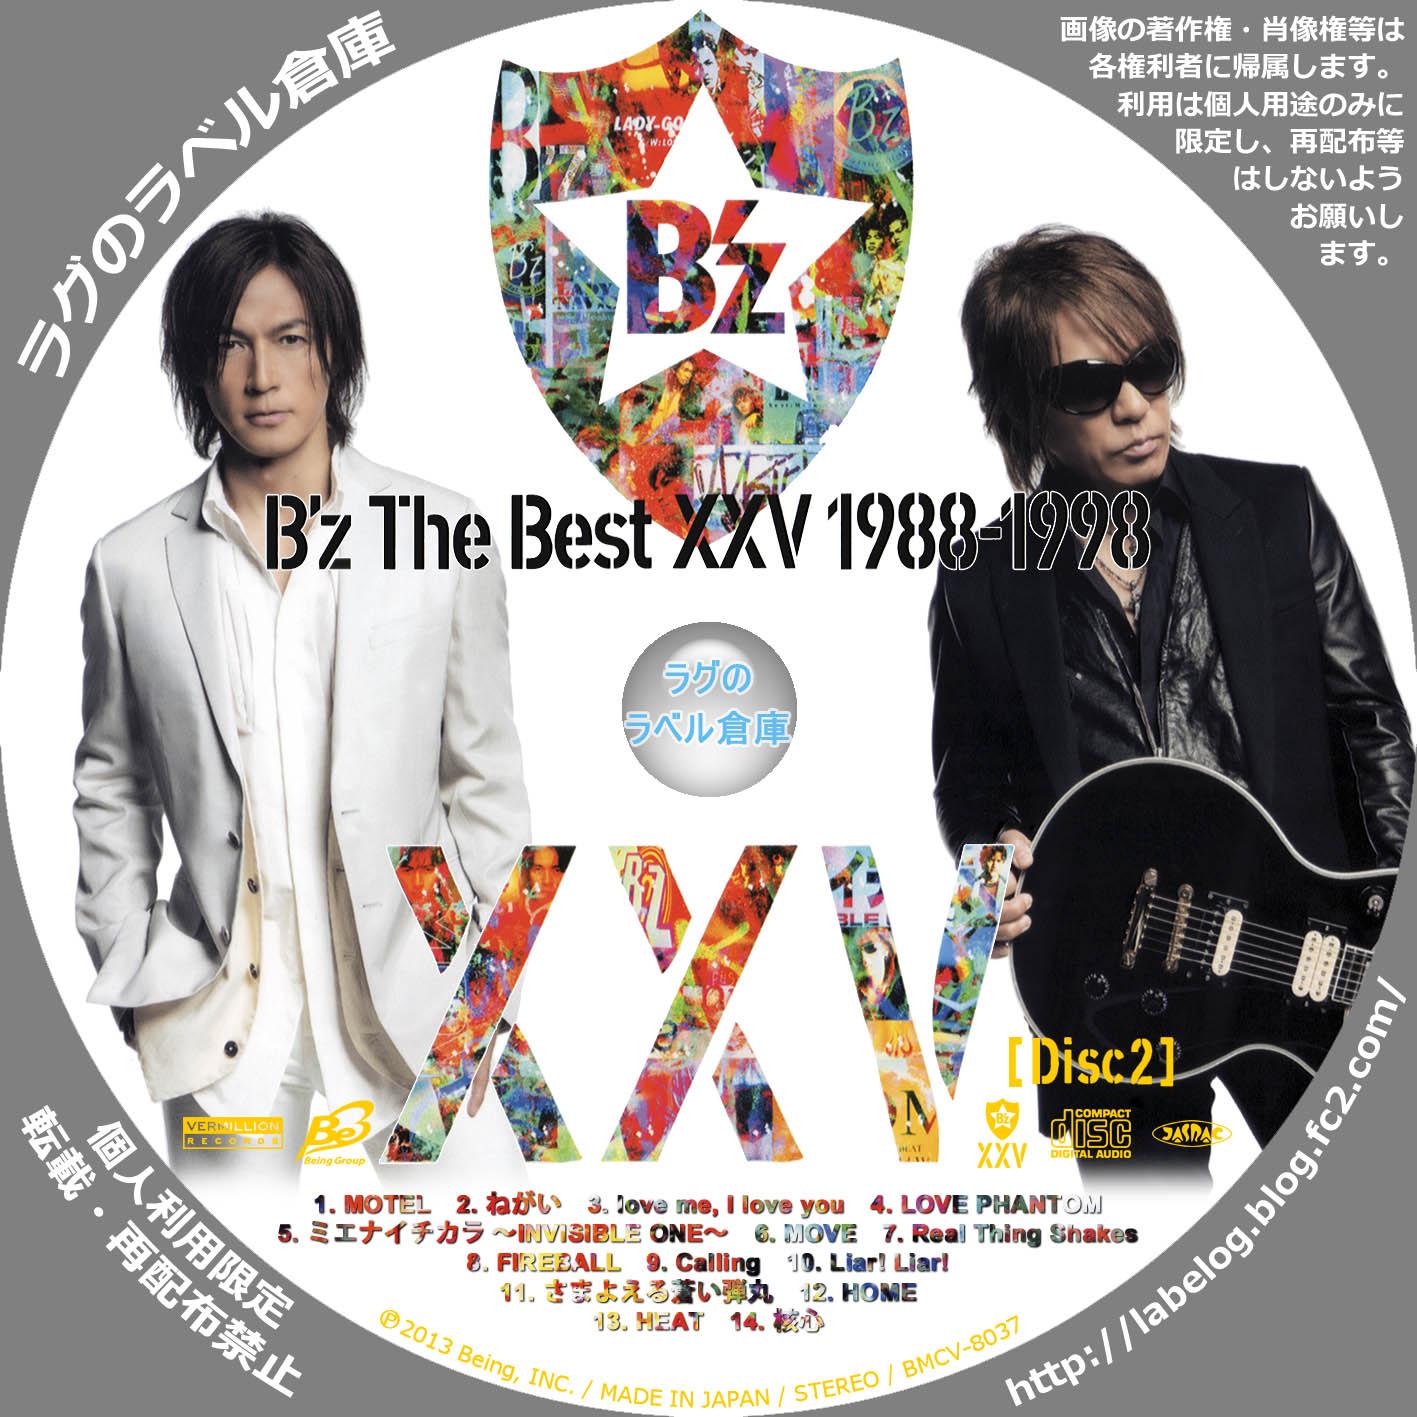 Dekade 1988 1998: カテゴリー :B'z BEST ALBUM ラグの CD / DVD / BD 自作ラベル倉庫